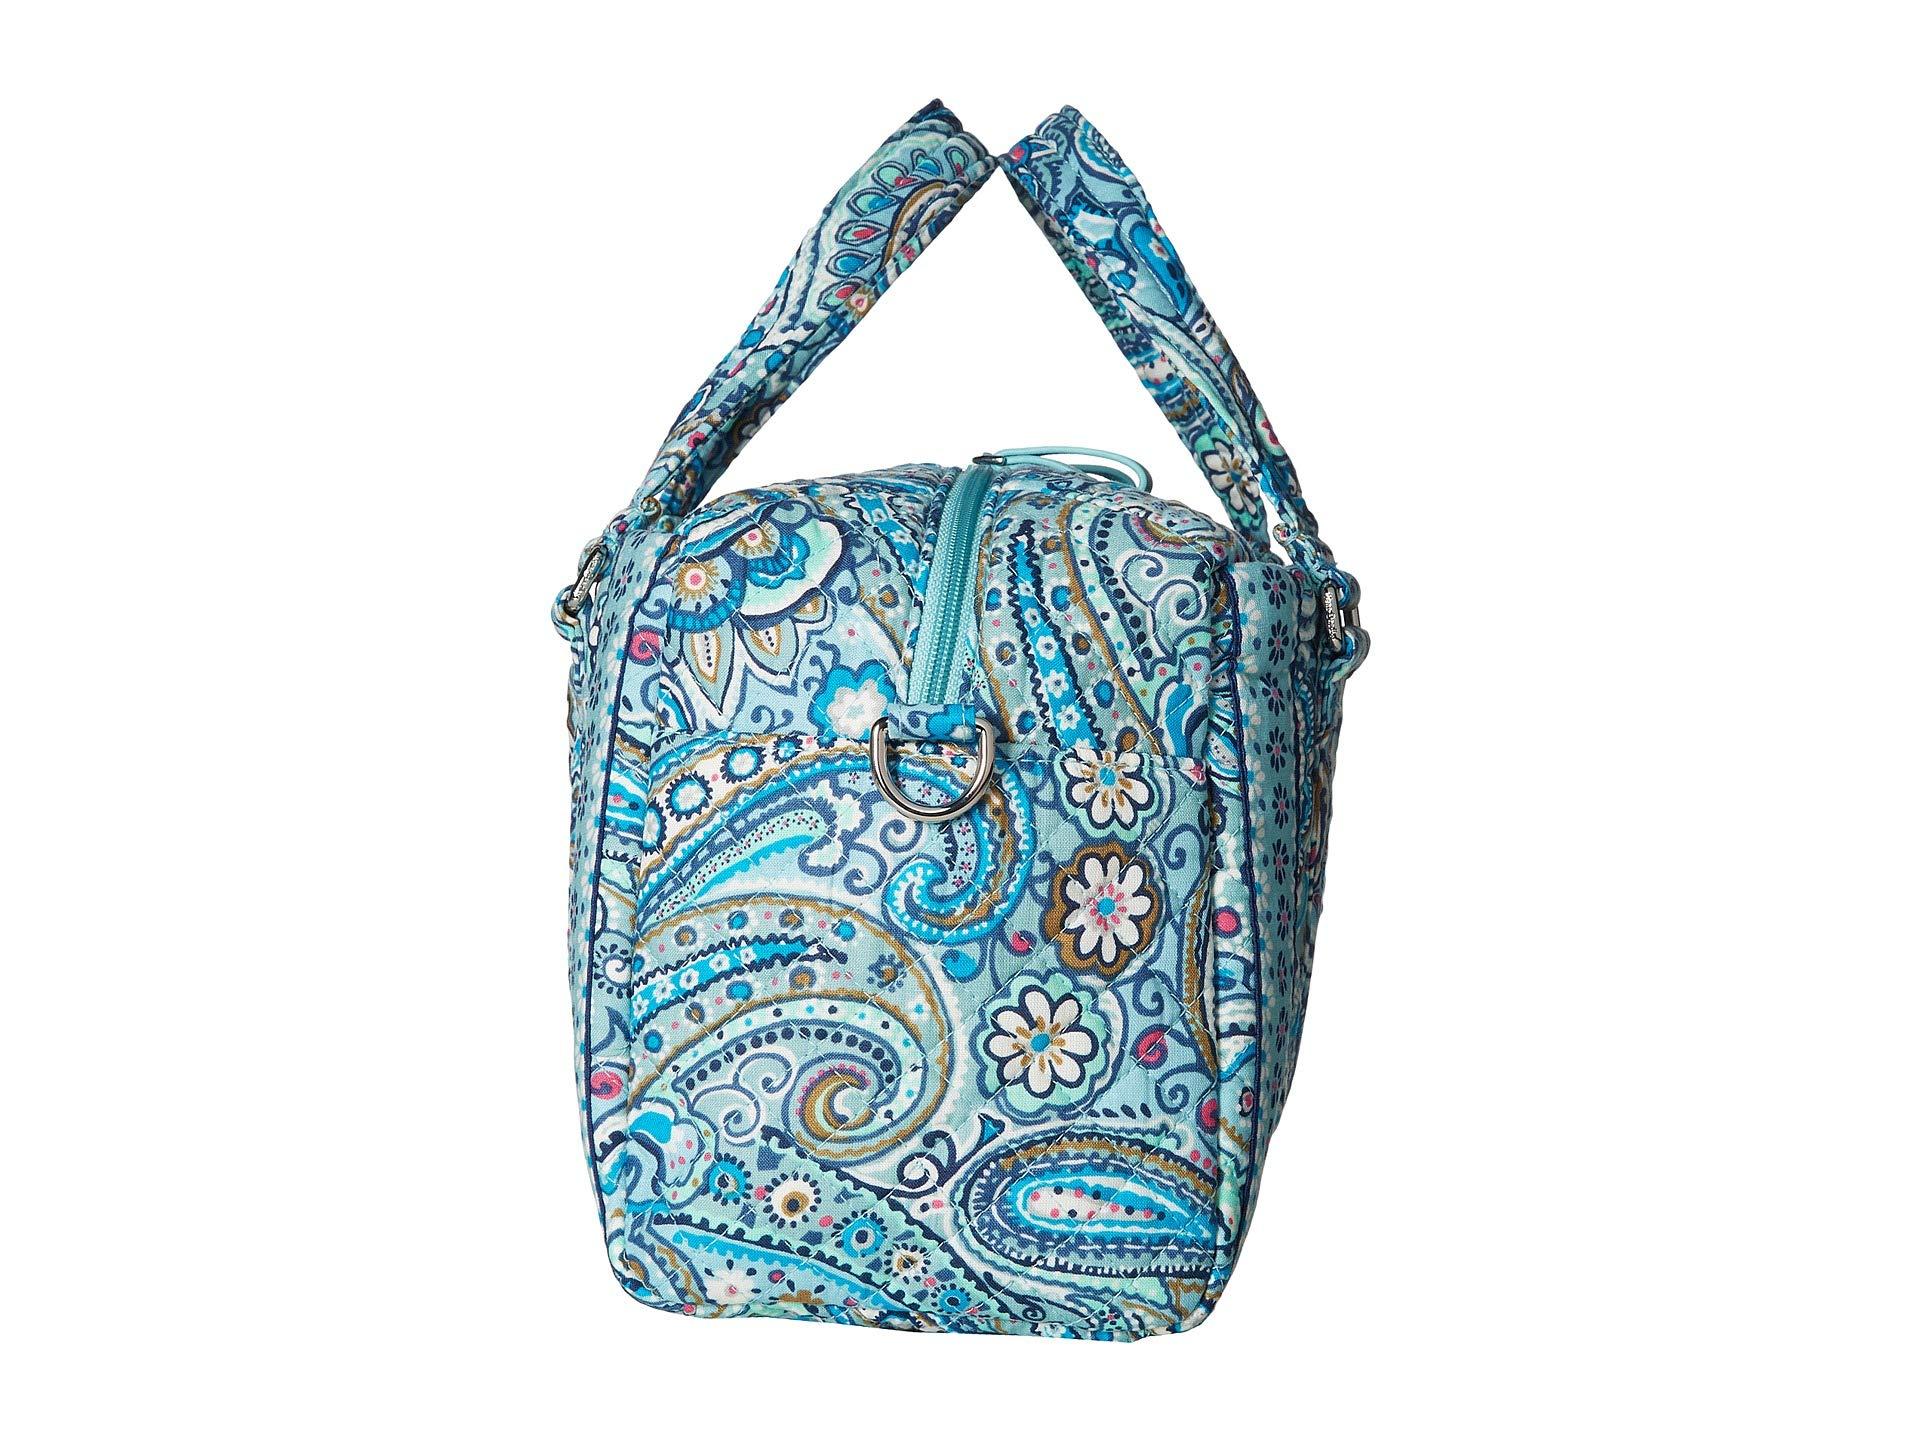 Vera 100 Iconic Handbag Bradley Dot Paisley Daisy r0avrWp6